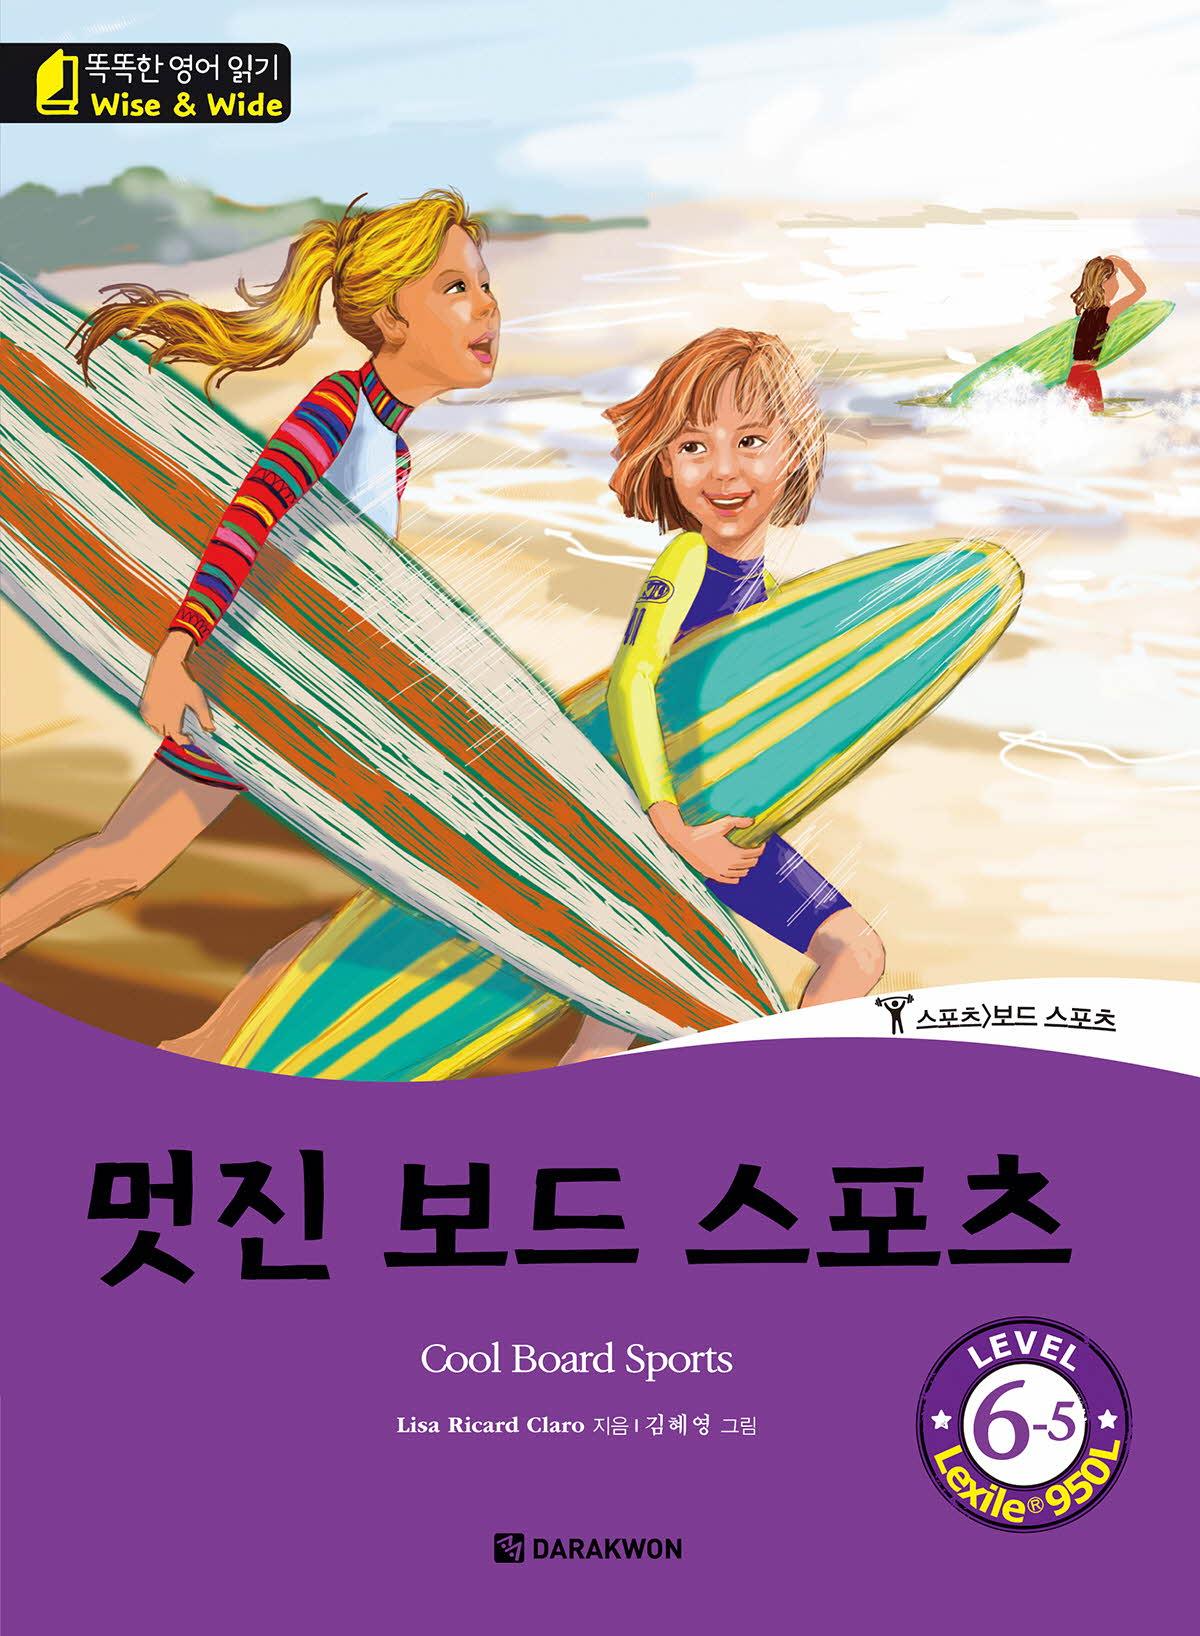 <a href='contents.php?CS_CODE=CS201803120055'>멋진 보드 스포츠 (Cool Board Sports)</a> 책표지